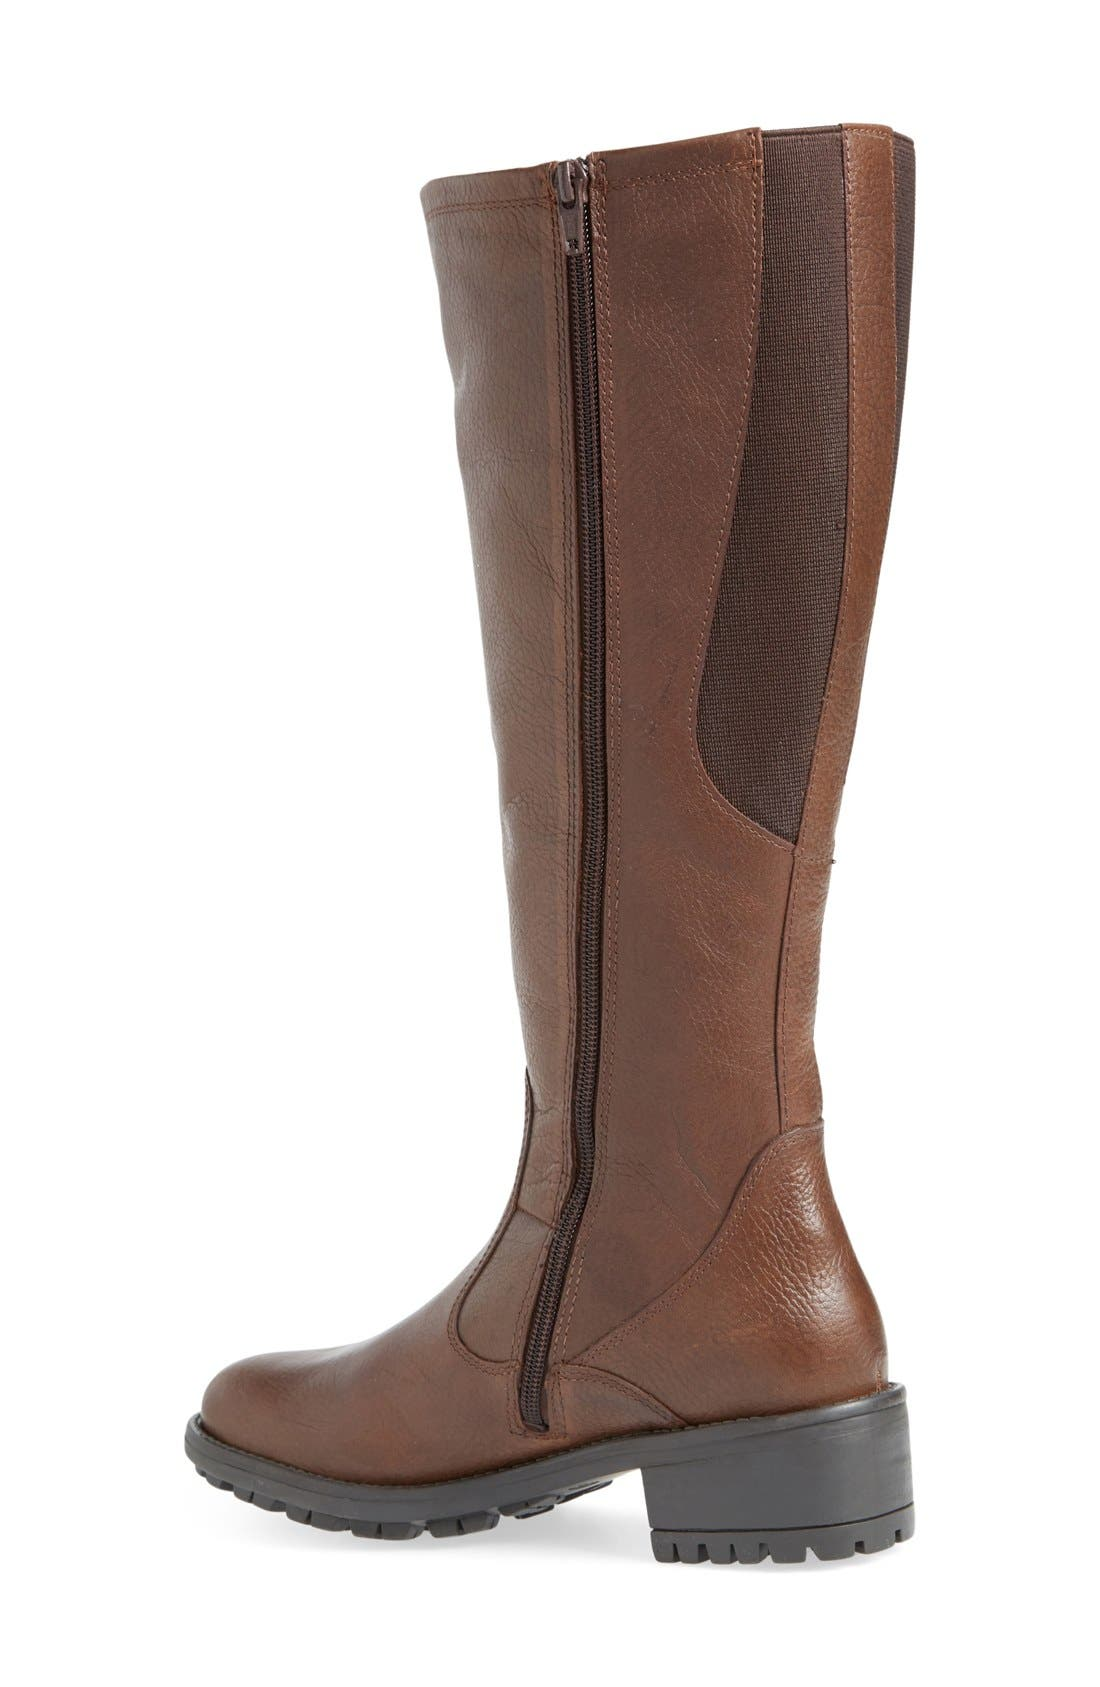 'Andrea' Waterproof Boot,                             Alternate thumbnail 3, color,                             Brown Pebbled Leather Regular